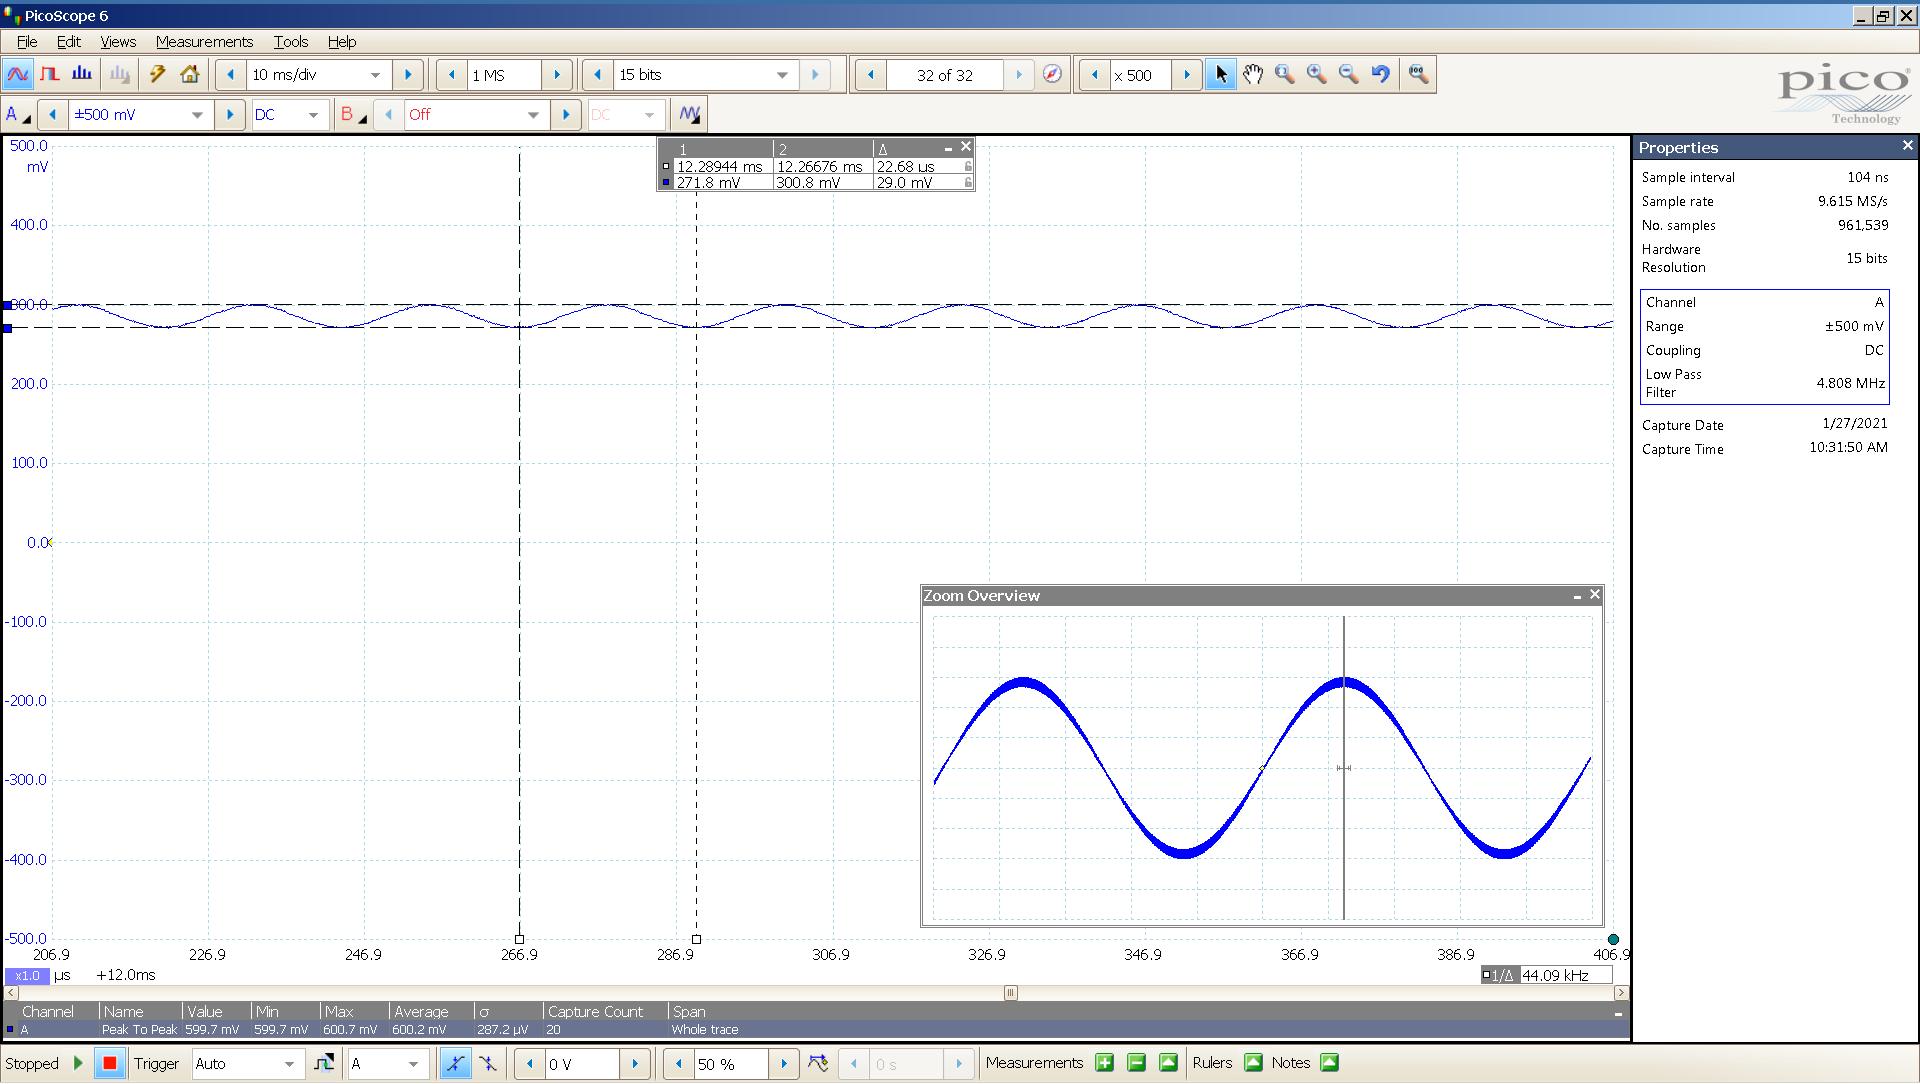 23 20210127 dac2541 20 Hz sine 570mVpp 20uS div 5MHz filter USB SE Slow BW calc.png